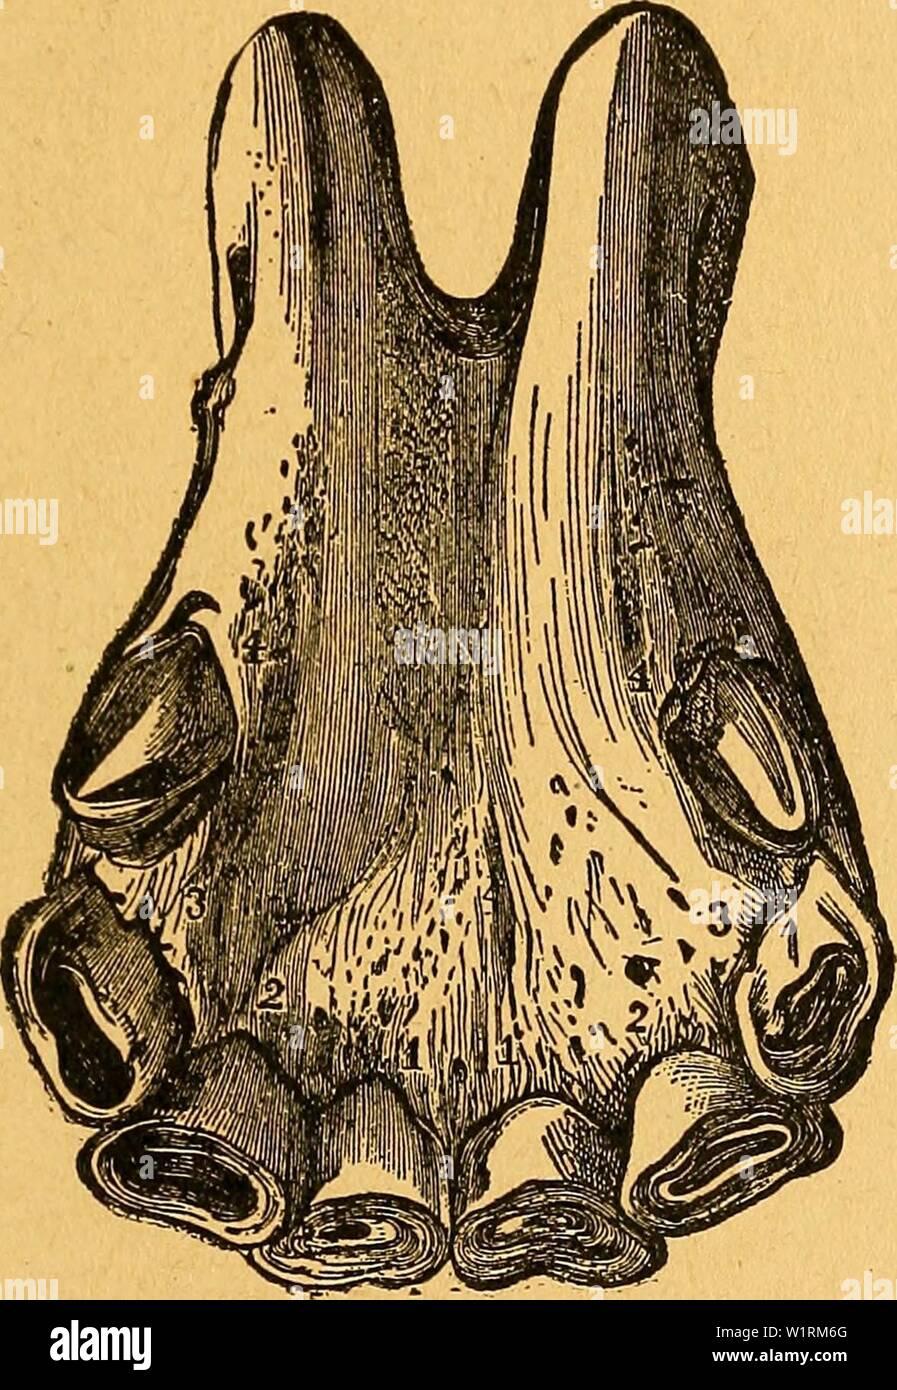 Archive image from page 70 of Das pferdebuch des amerikanischen farmers. Das pferdebuch des amerikanischen farmers  daspferdebuchdes00hoff Year: 1917 SJom (Srfciirtcn bc3 2llter§ fiel jferben. 65 53?it.bcm ftcbcutcit 'ai)ve i[t on ben djärincn hcB OBcrlcfer§ ein tpQfcn tcmcrfbar, iüäfircnb ber ern bc§ 3h)citGn aare§ ber d)Ticibc3äIjnc gänalid) öerh)ifcf)t ift unb an ben $Qfen3äI)nett beut= Iirf)e Innren ber 9f&nüt3nng toofirgenommen ioerben. Wit bem ad]ien v;al)r ift ber ÜQvn au§ allen d)neibe3äl)nen be§ UnterfteferS ab- genügt unb tritt berfclöe im mittleren oar be§ DBerfieferB biel luonigcr - Stock Image